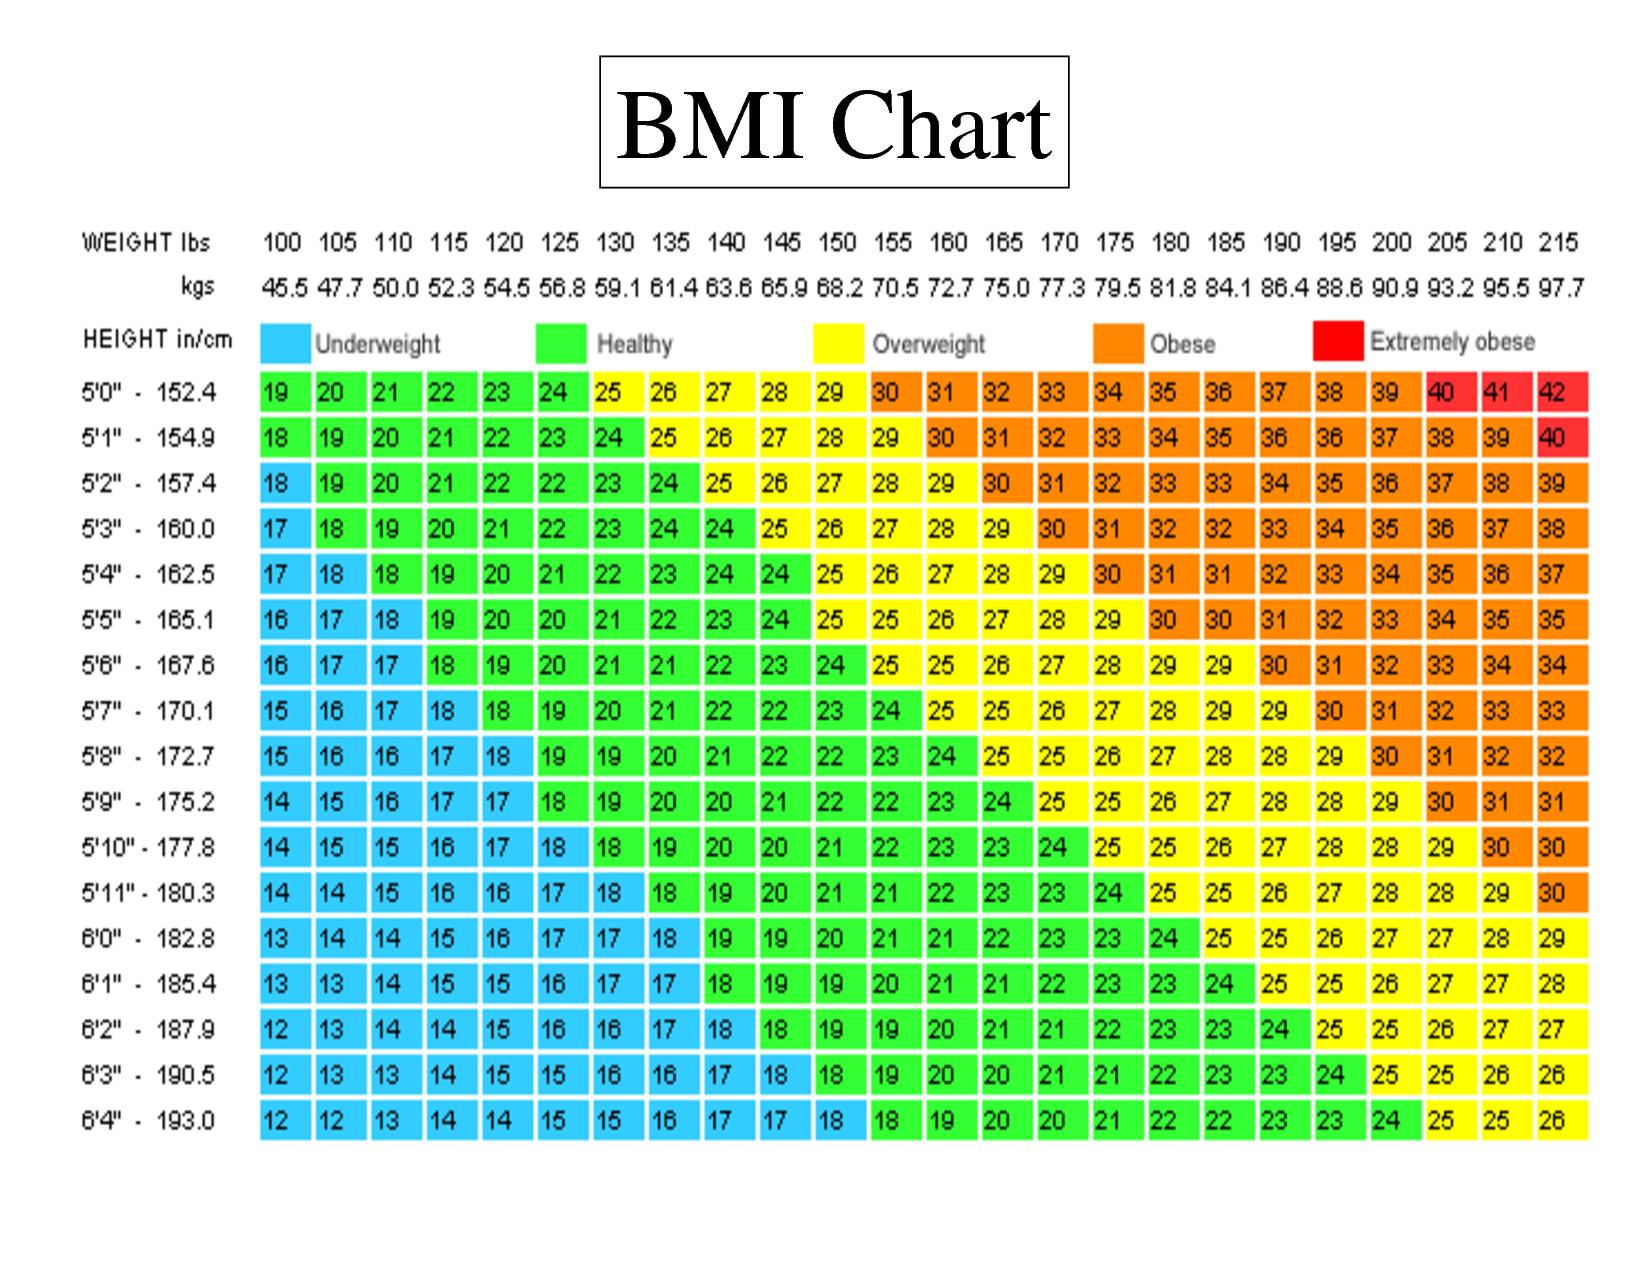 Image Source: https://www.nscclinics.co.uk/slimming/weight-loss-tools/health-chart/